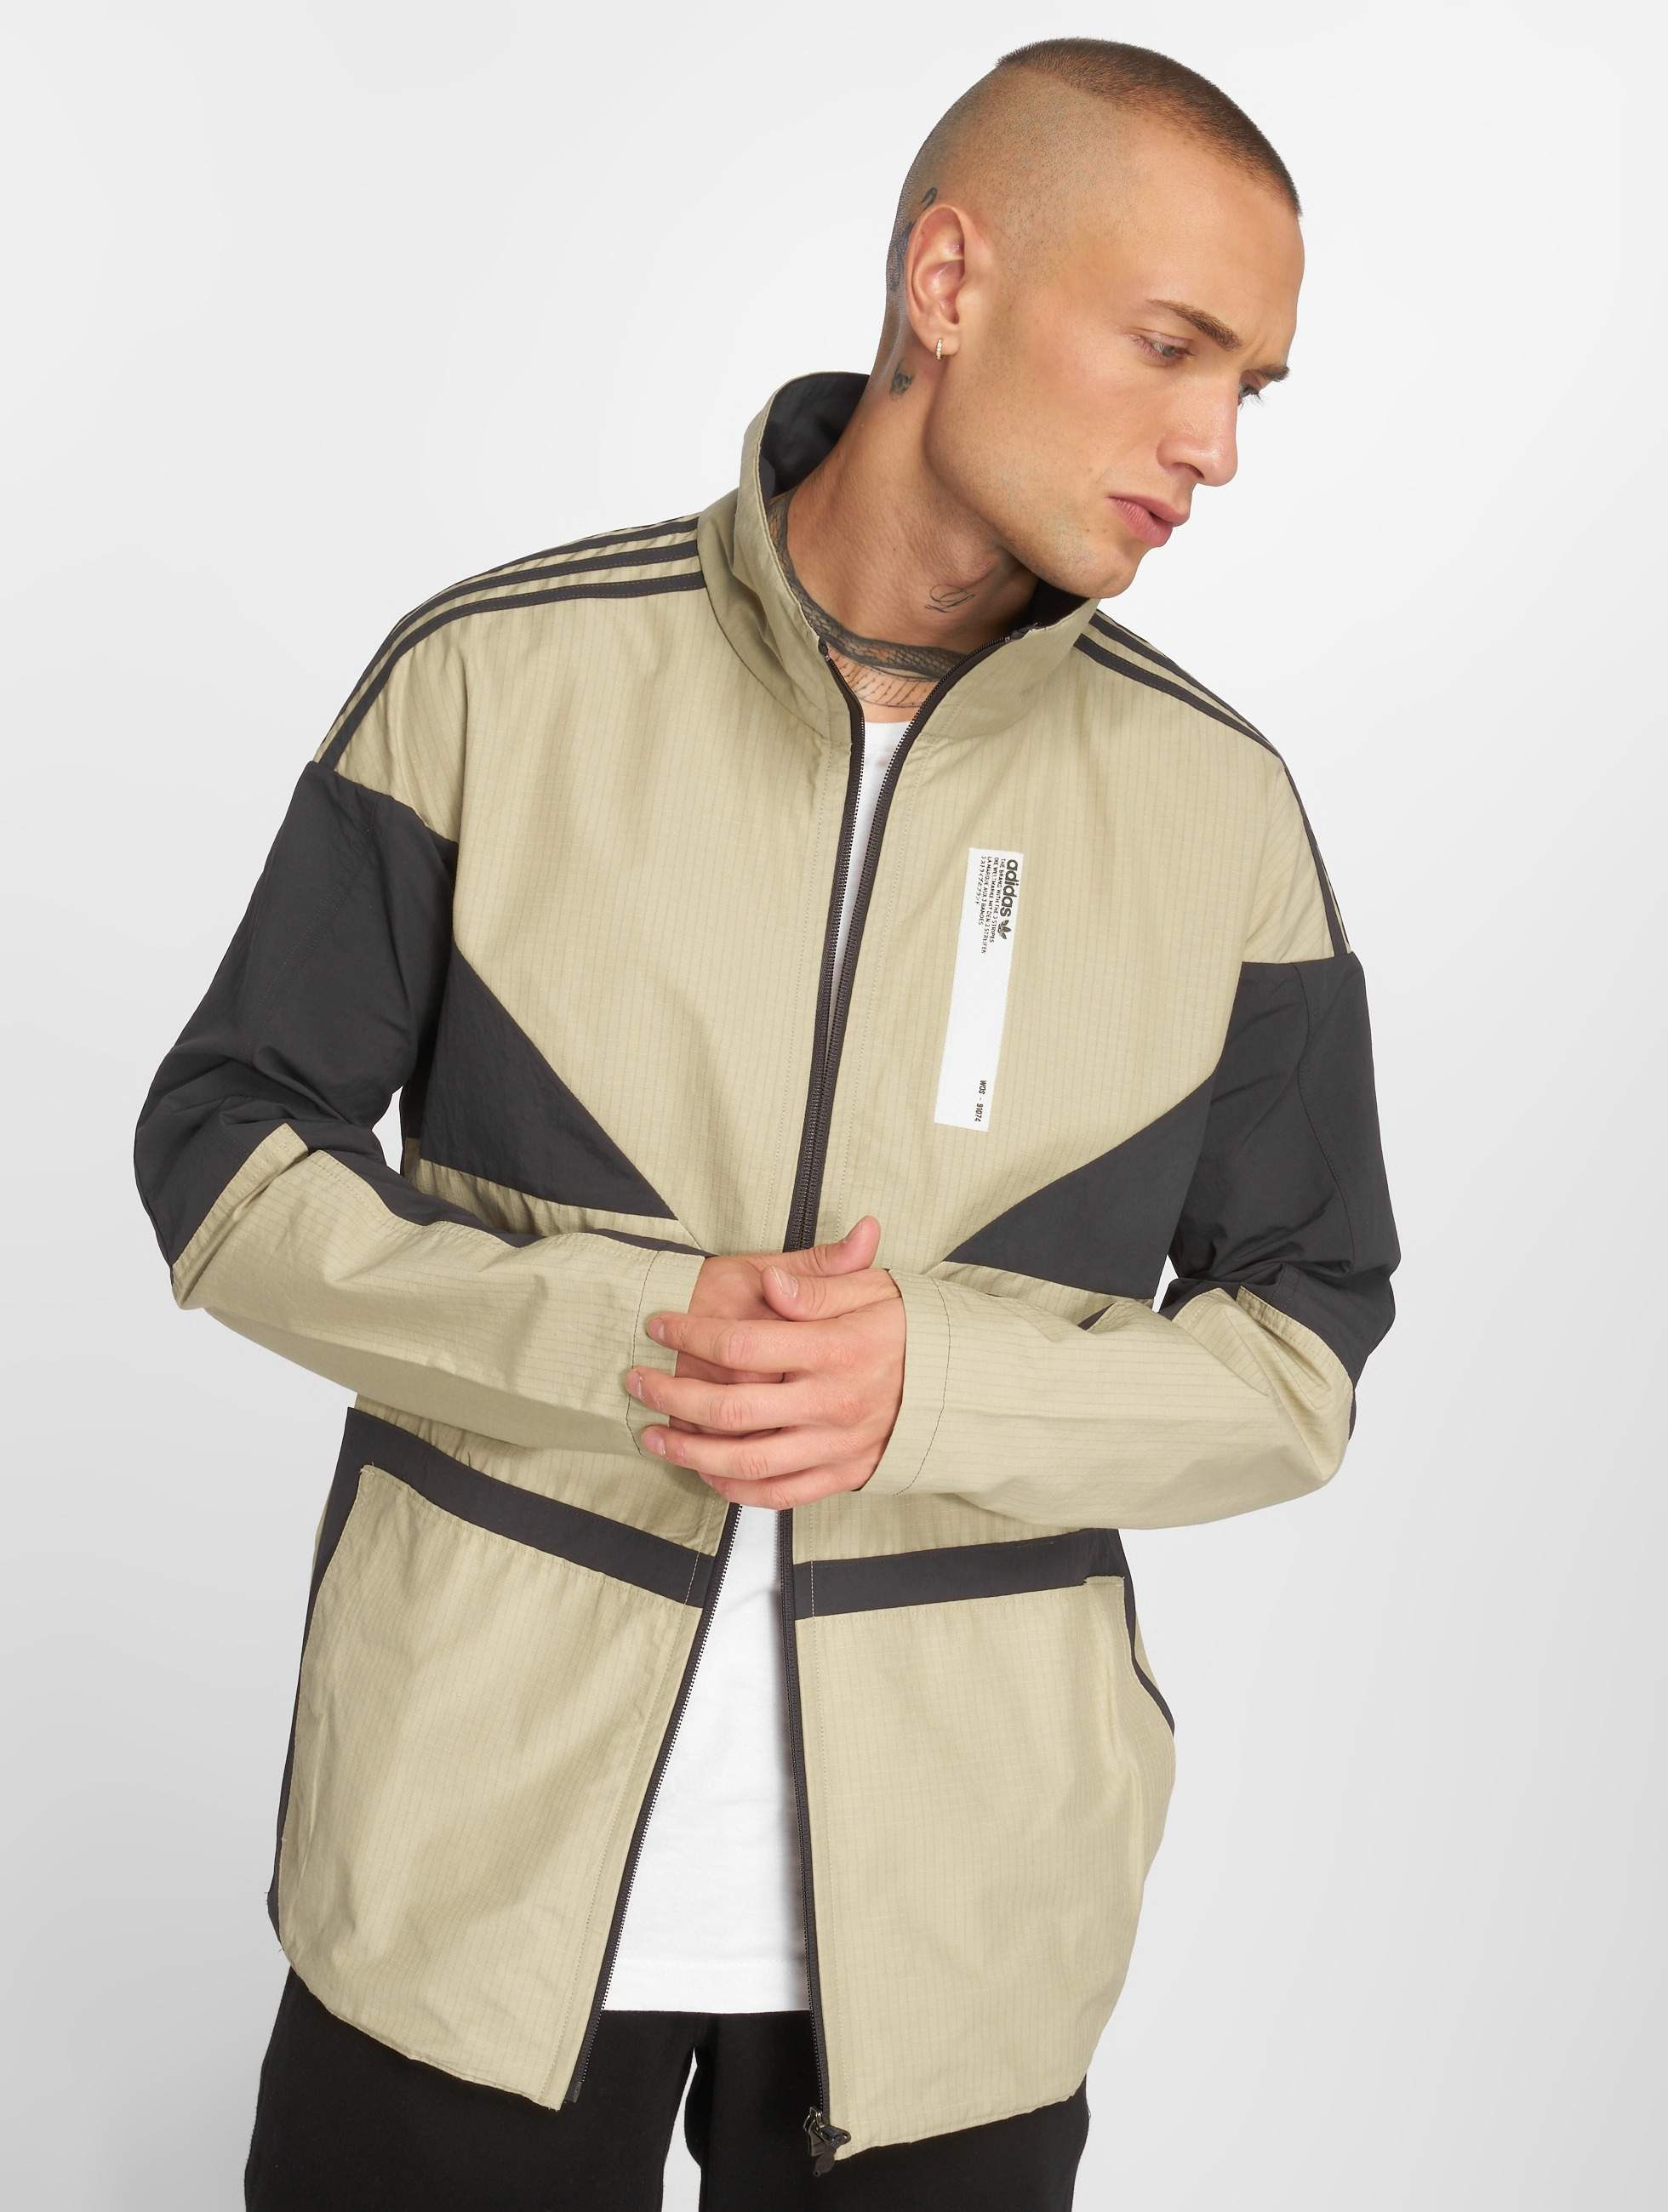 Adidas Originals Nmd Track Top Transition Jacket Raw Golden